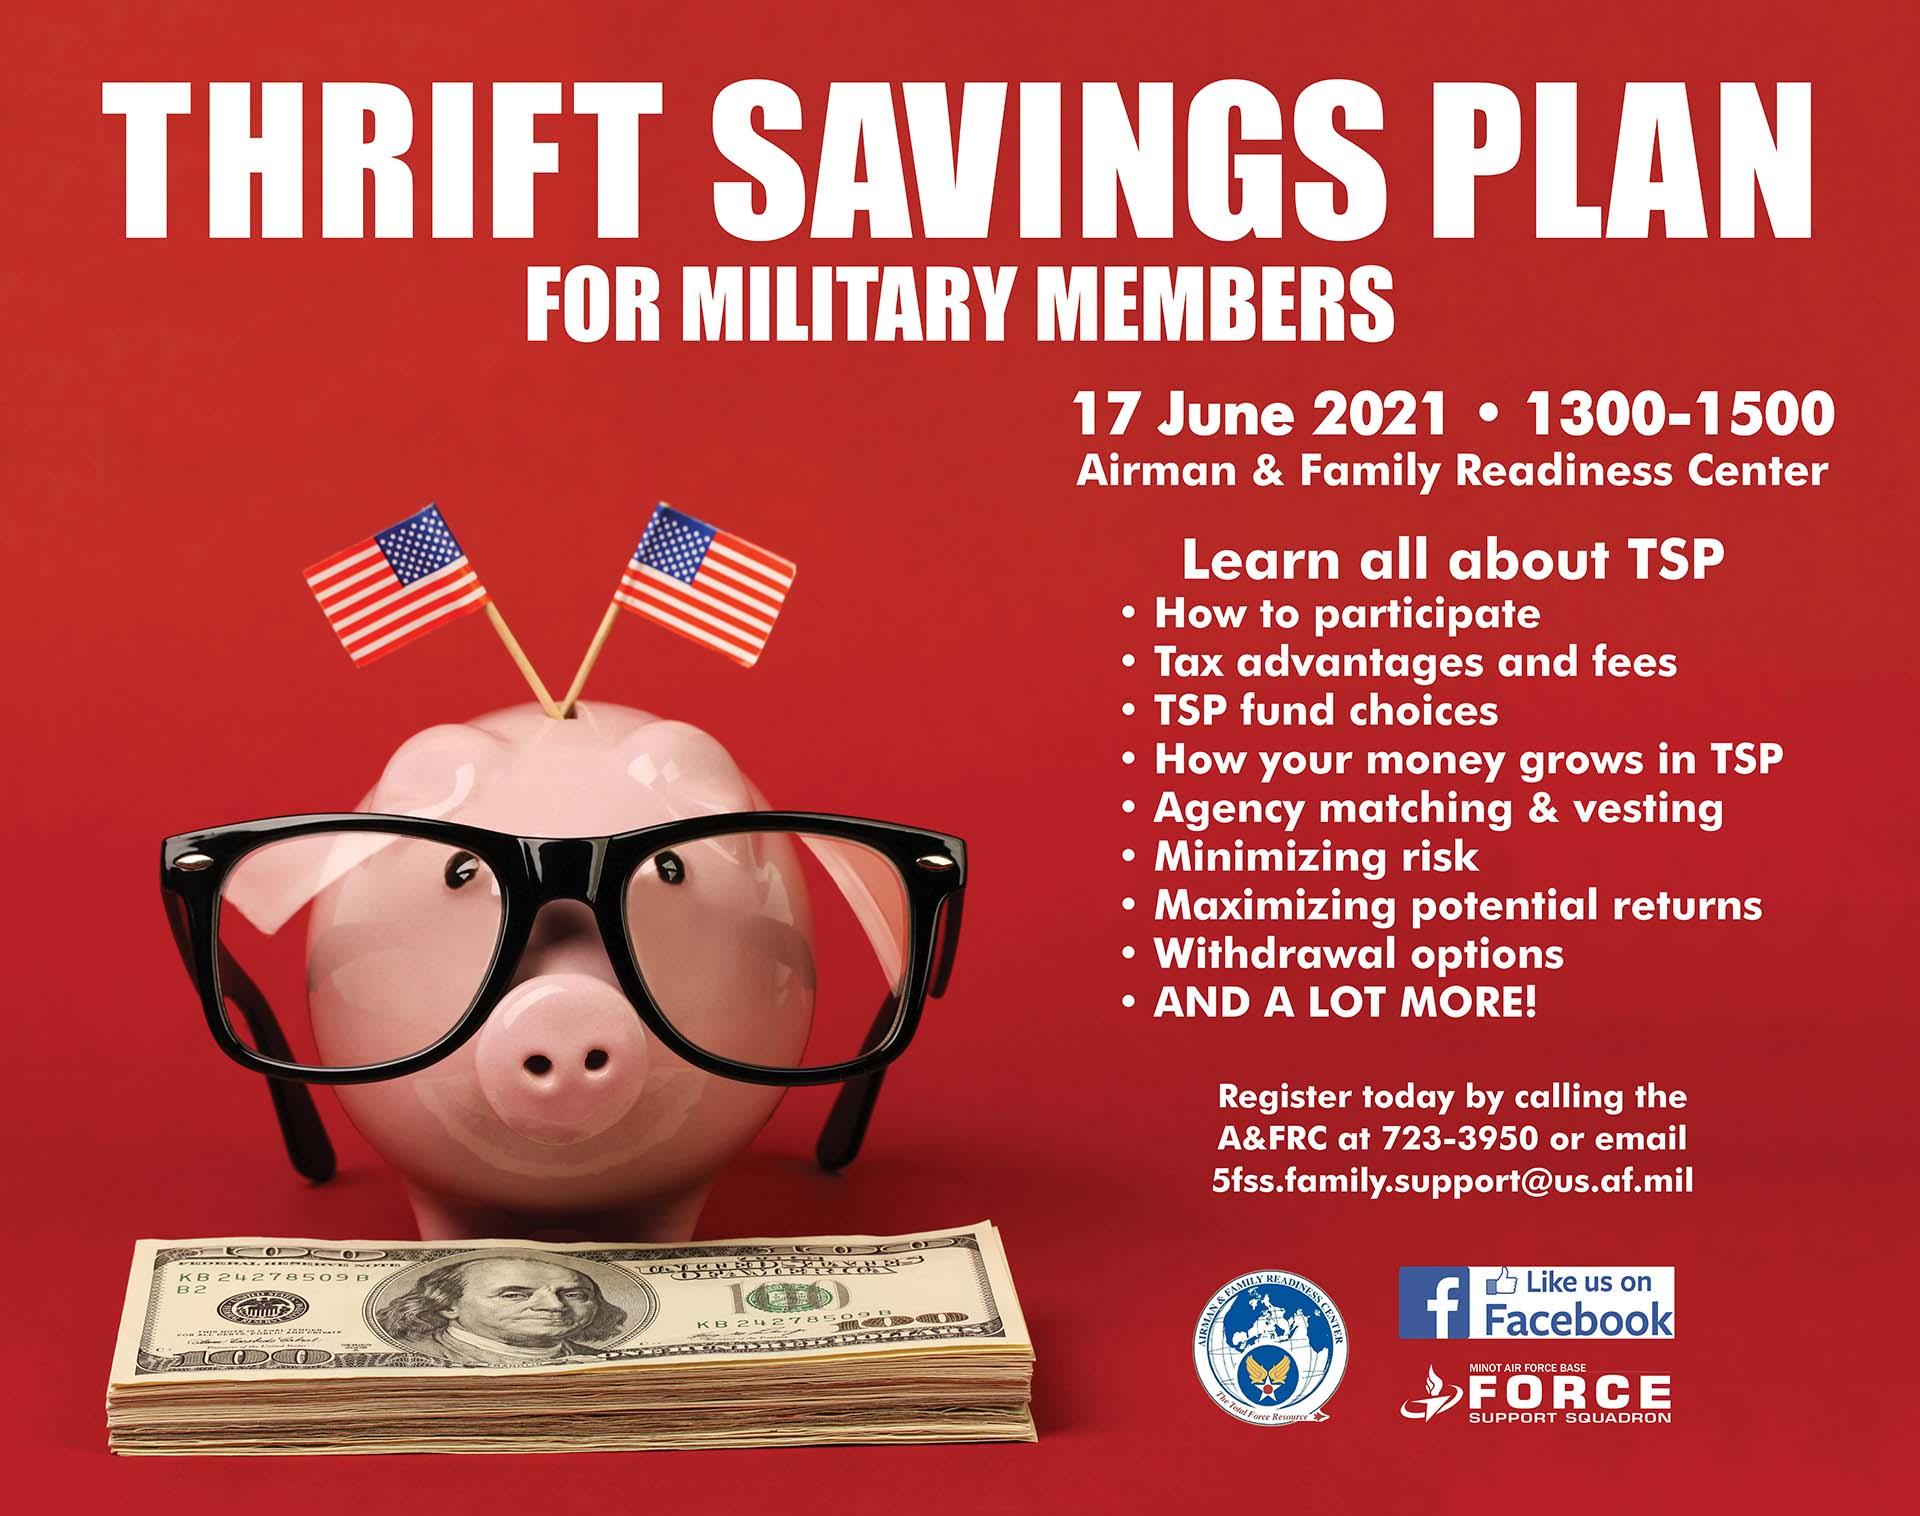 Thrift Savings Plan for Military Members